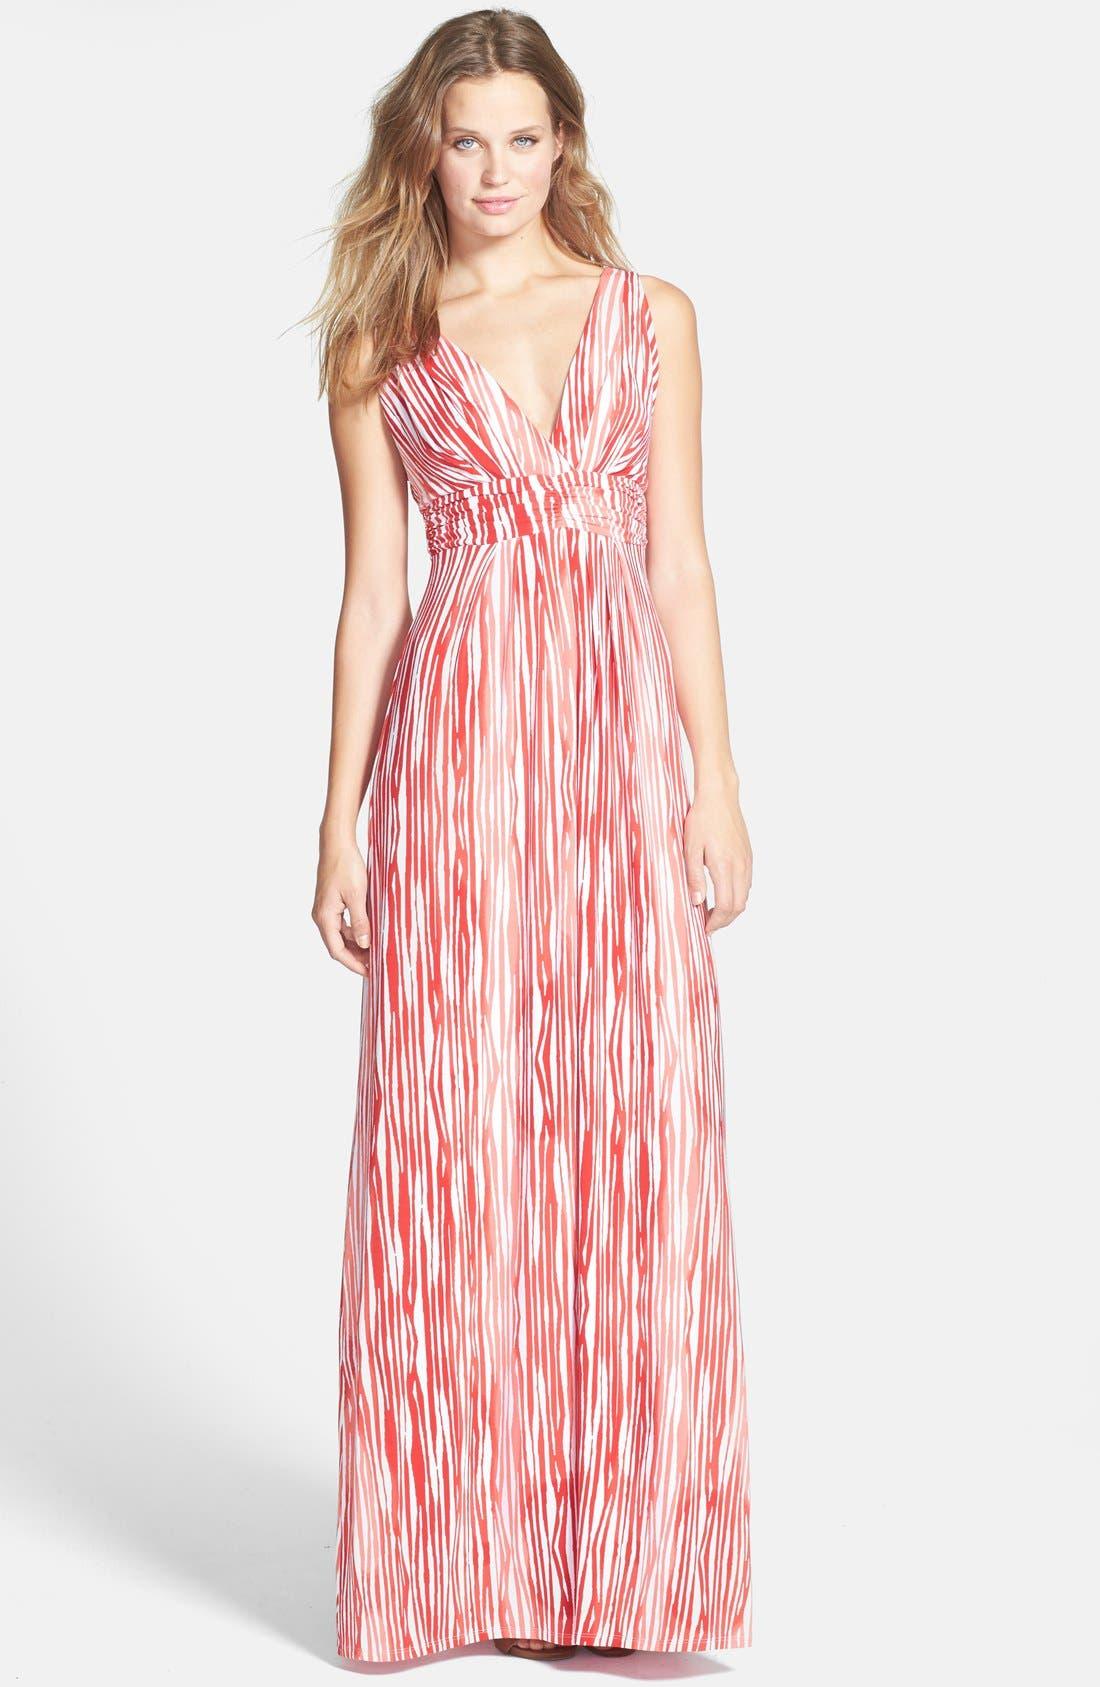 Main Image - Tart 'Adrianna' Surplice Print Jersey Maxi Dress